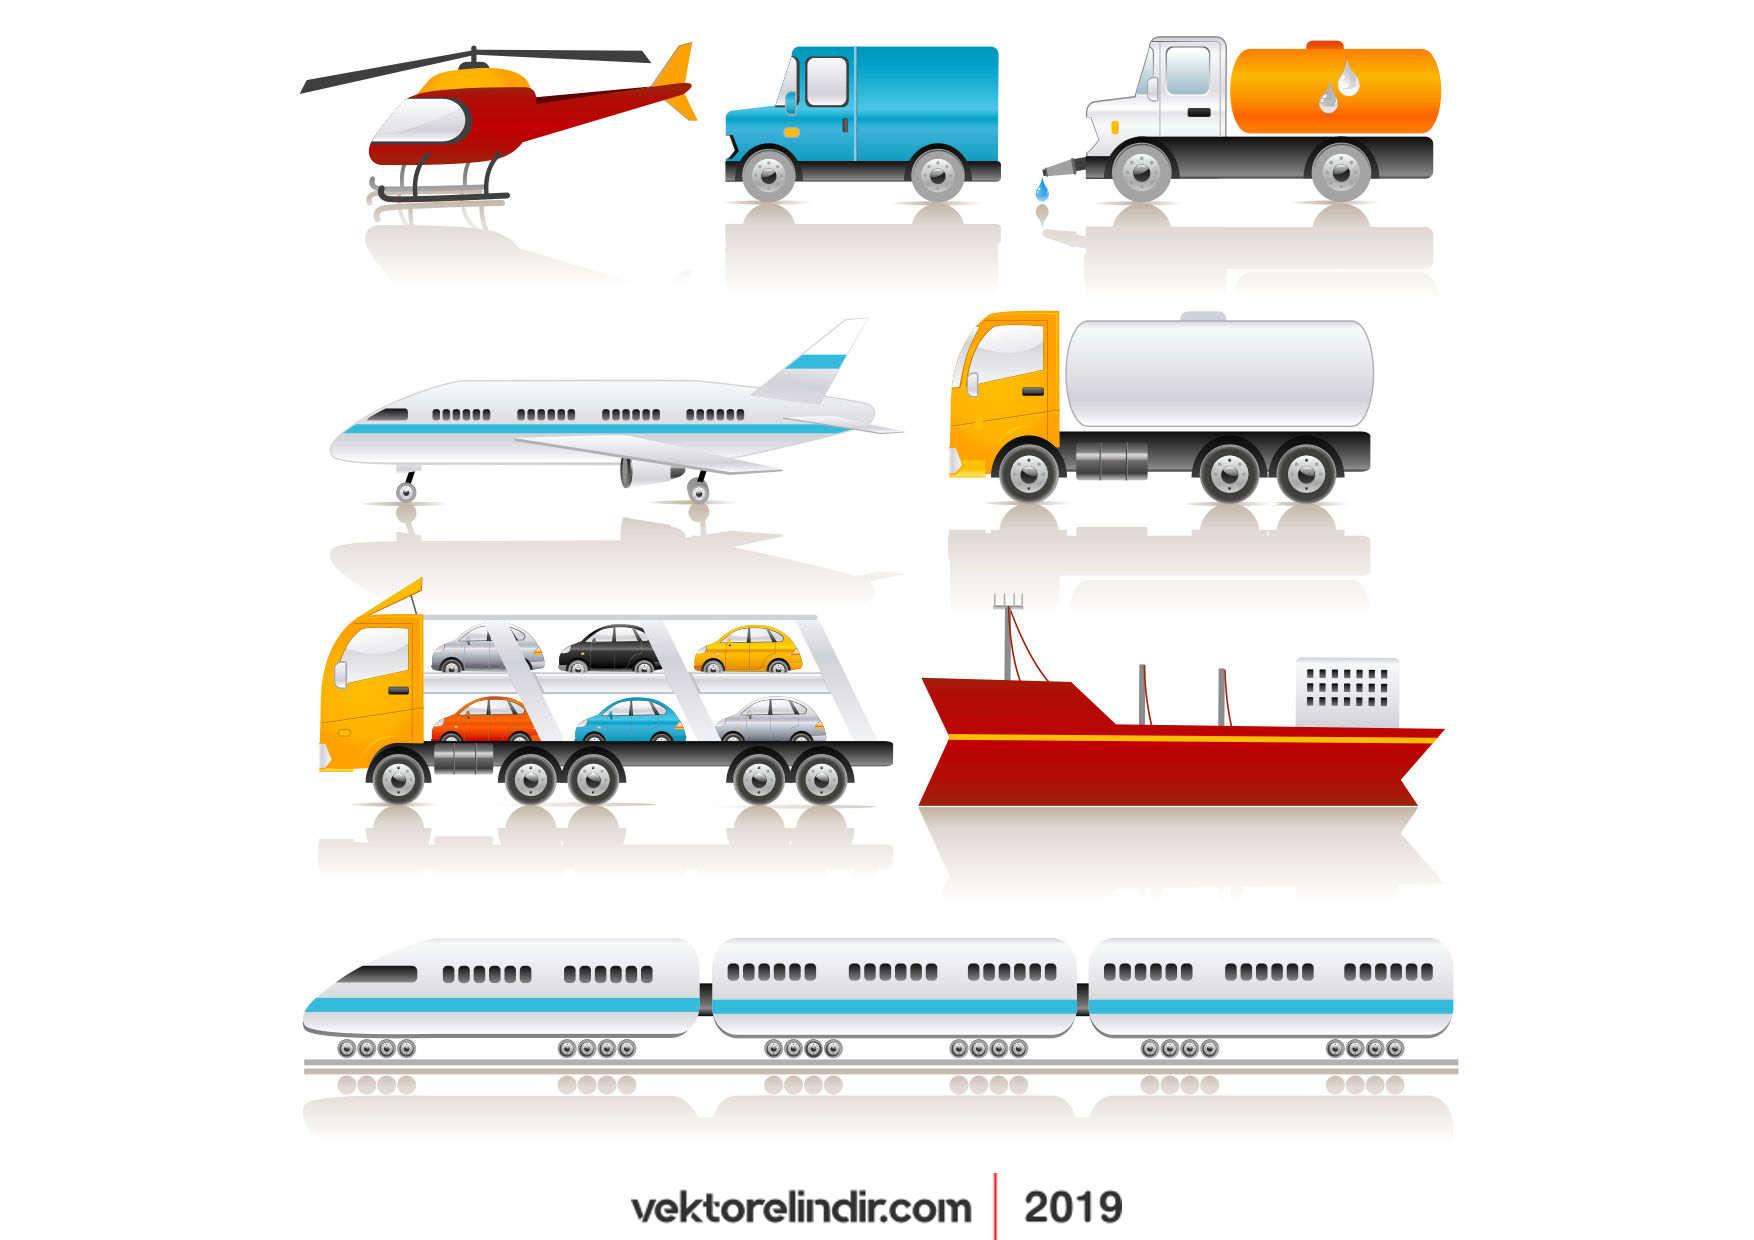 Helikopter, Gemi, Tren, Mikser